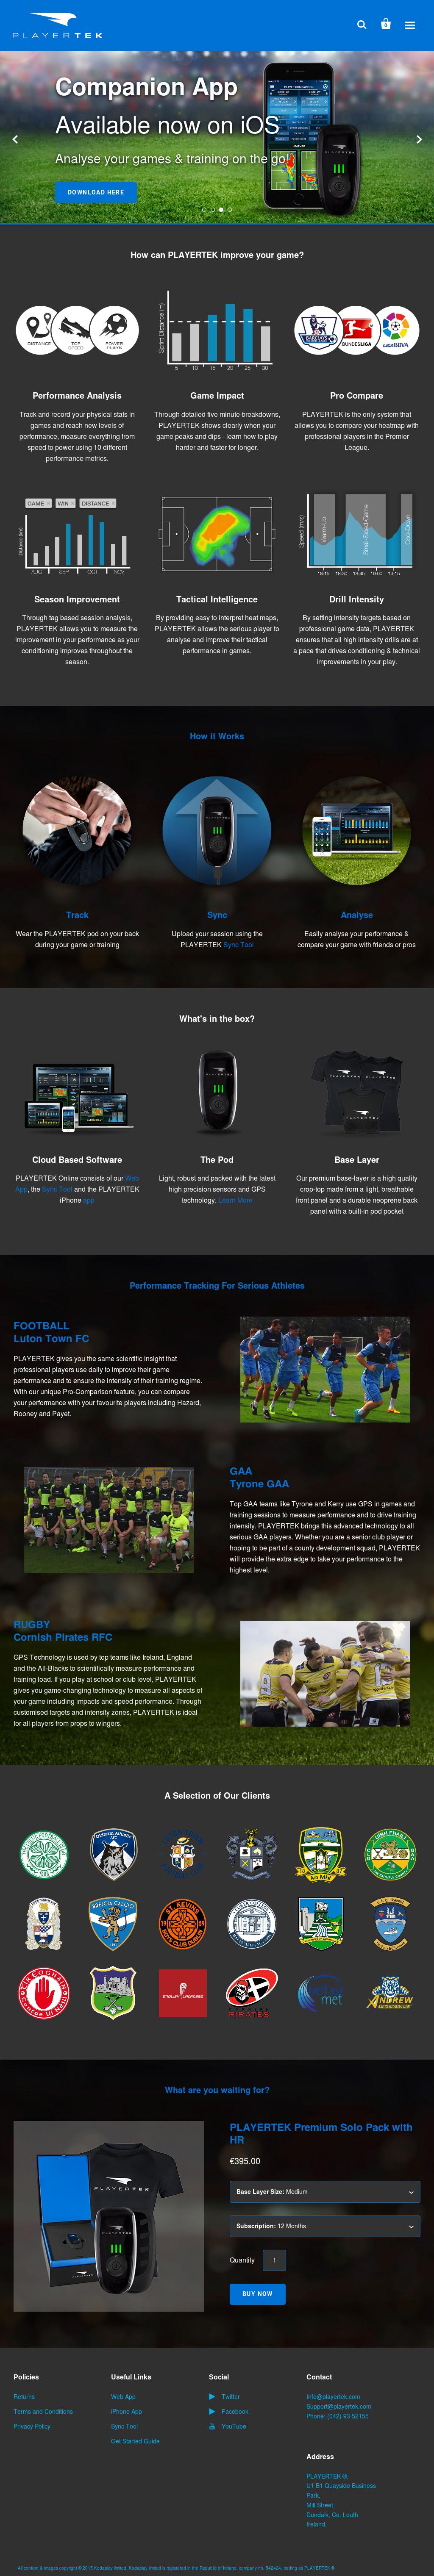 PLAYERTEK Competitors, Revenue and Employees - Owler Company Profile